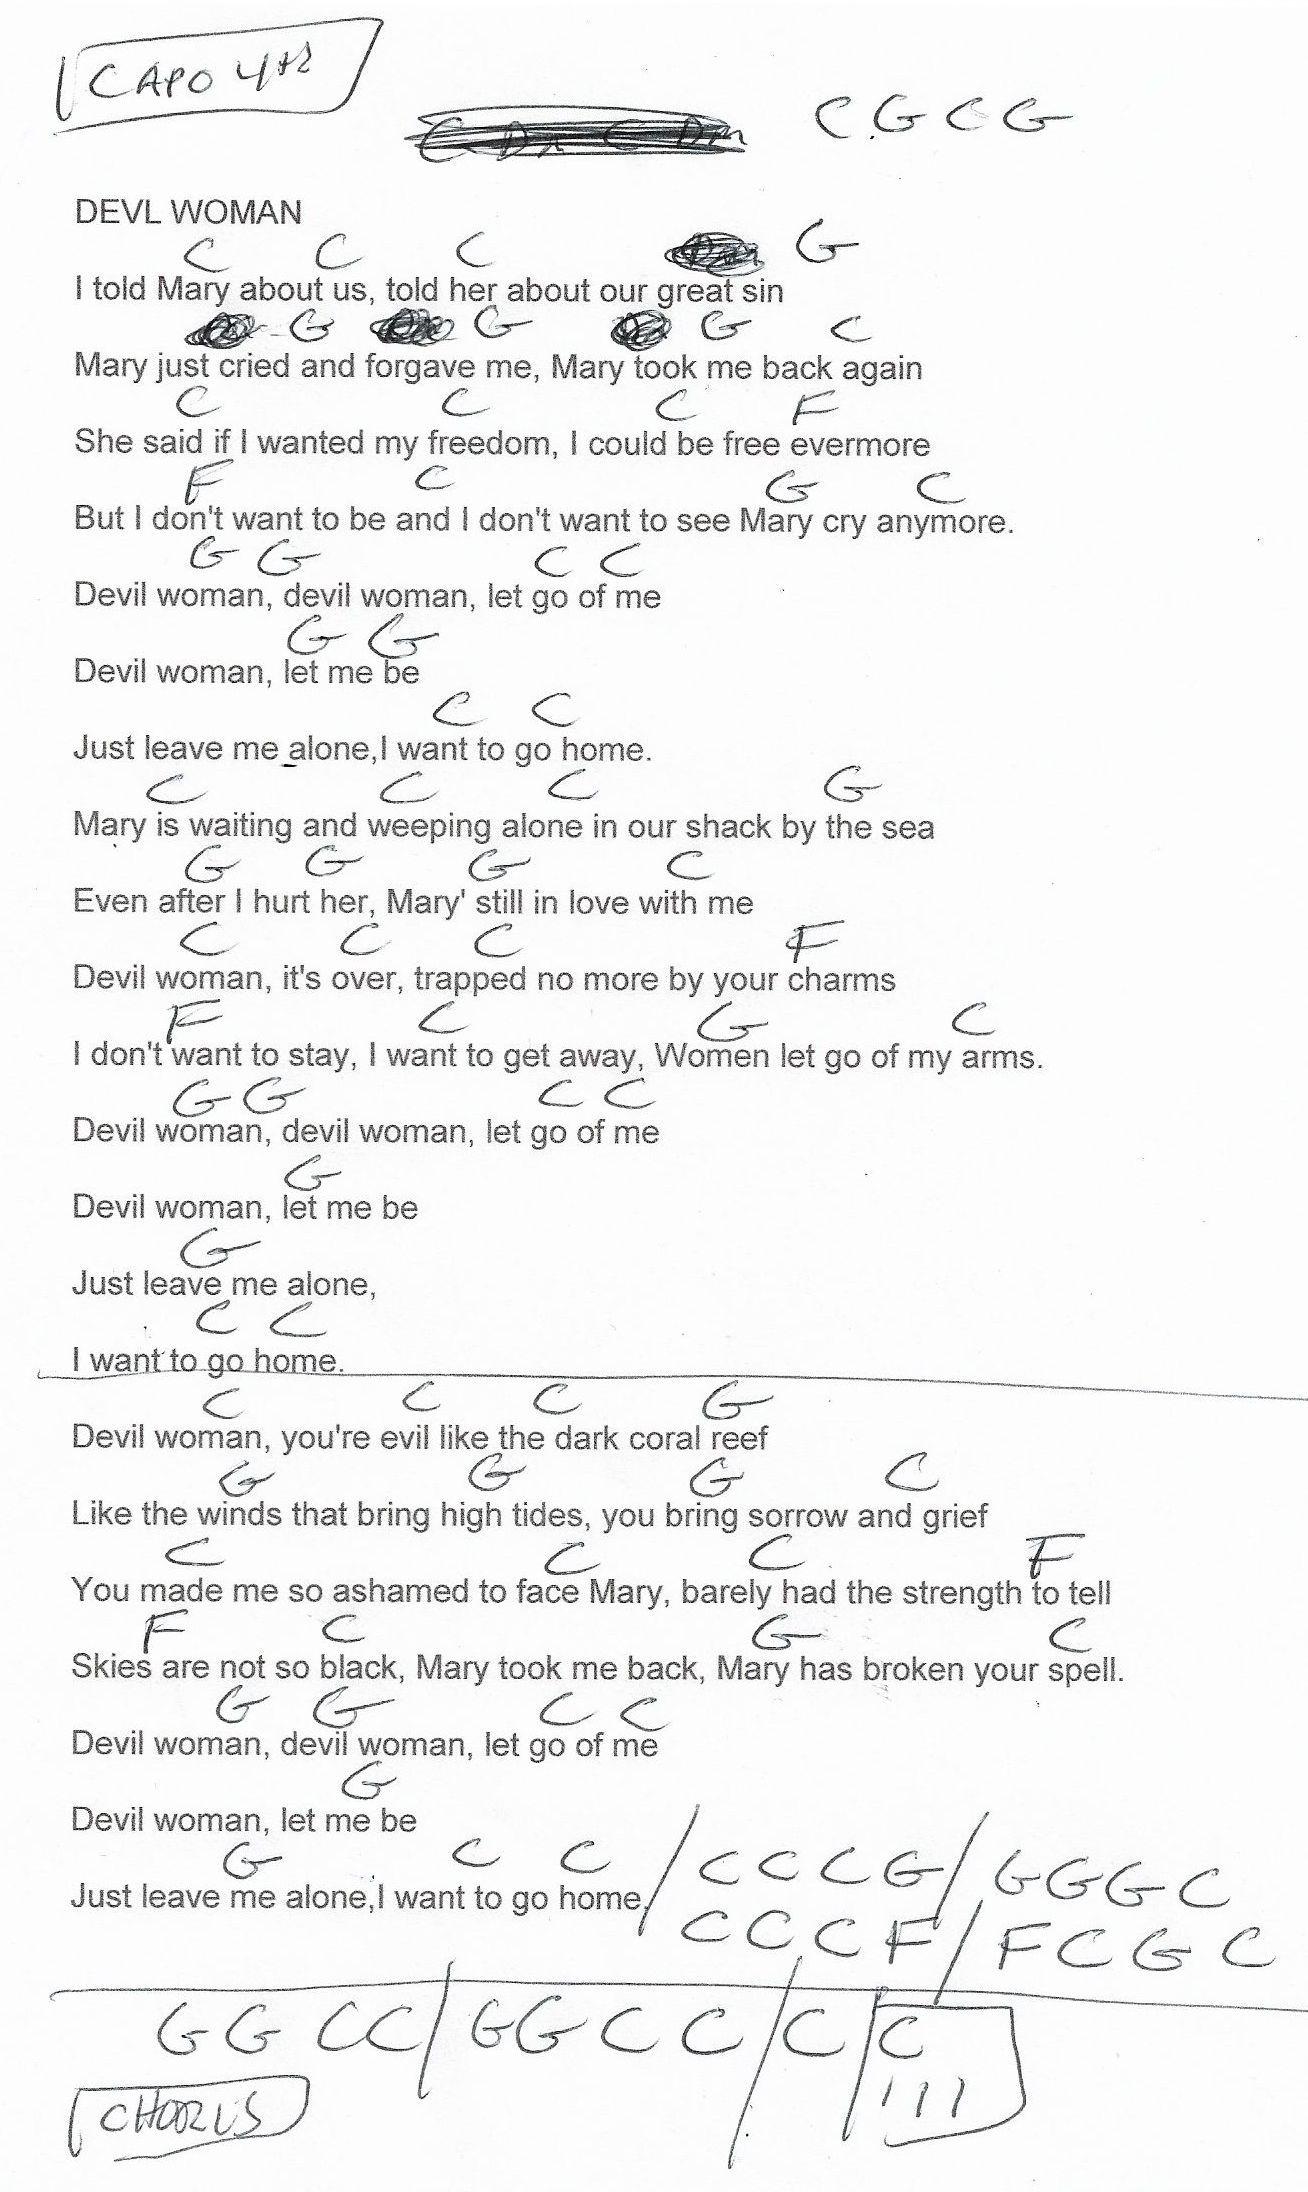 Devil Woman Marty Robbins Guitar Chord Chart Capo 4th 2018